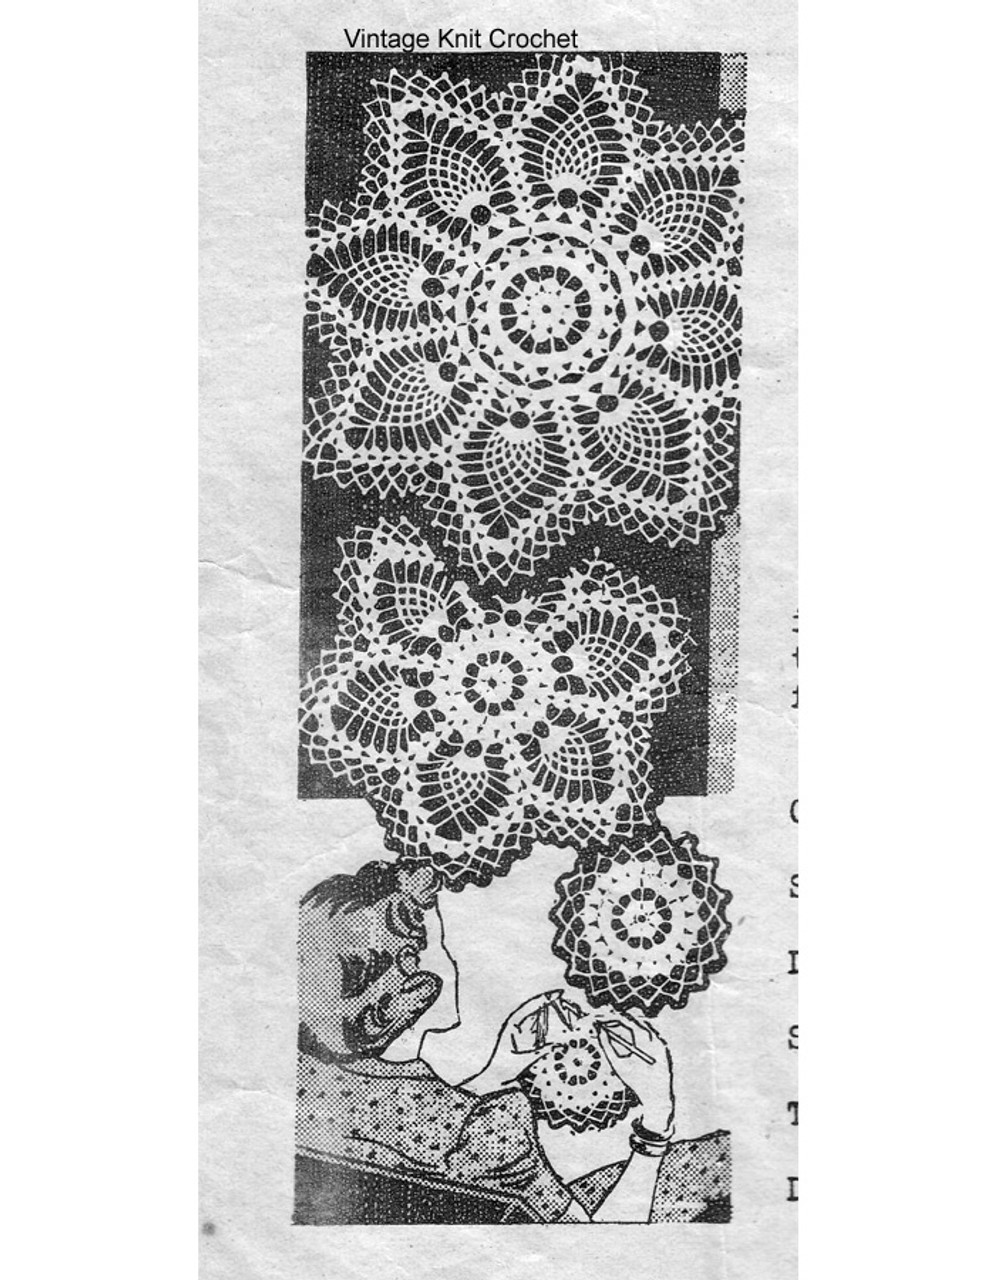 Vintage Crochet Pineapple Doilies Pattern, Alice Brooks 7389